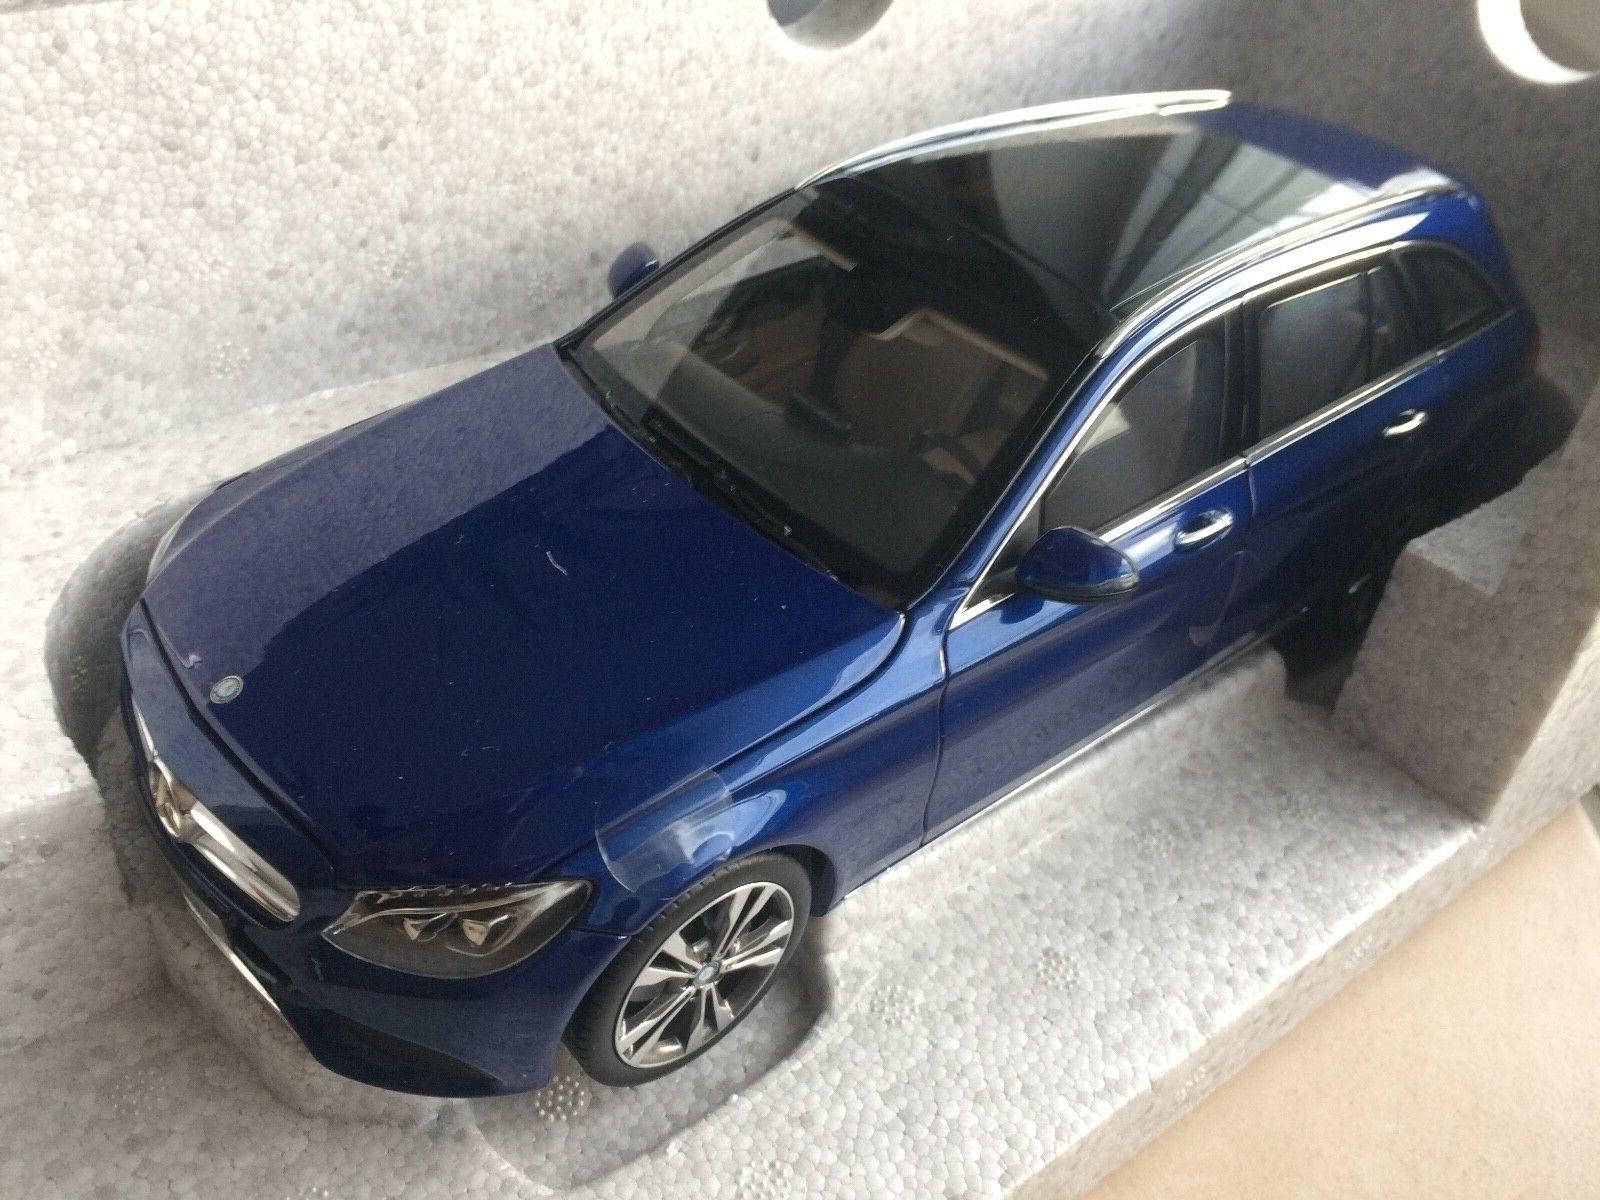 1 18 Norev Mercedes C Klasse T Model brilliantblau metallic Neu OVP 6 x öffnend